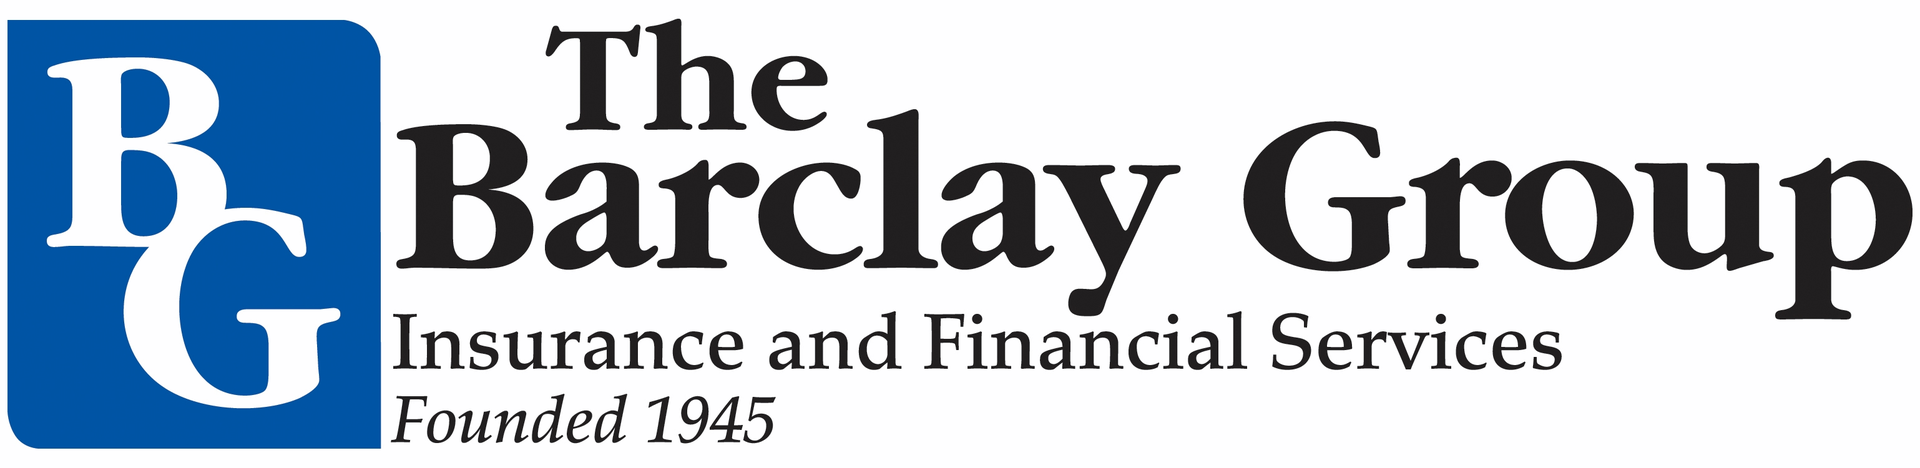 The Barclay Group logo